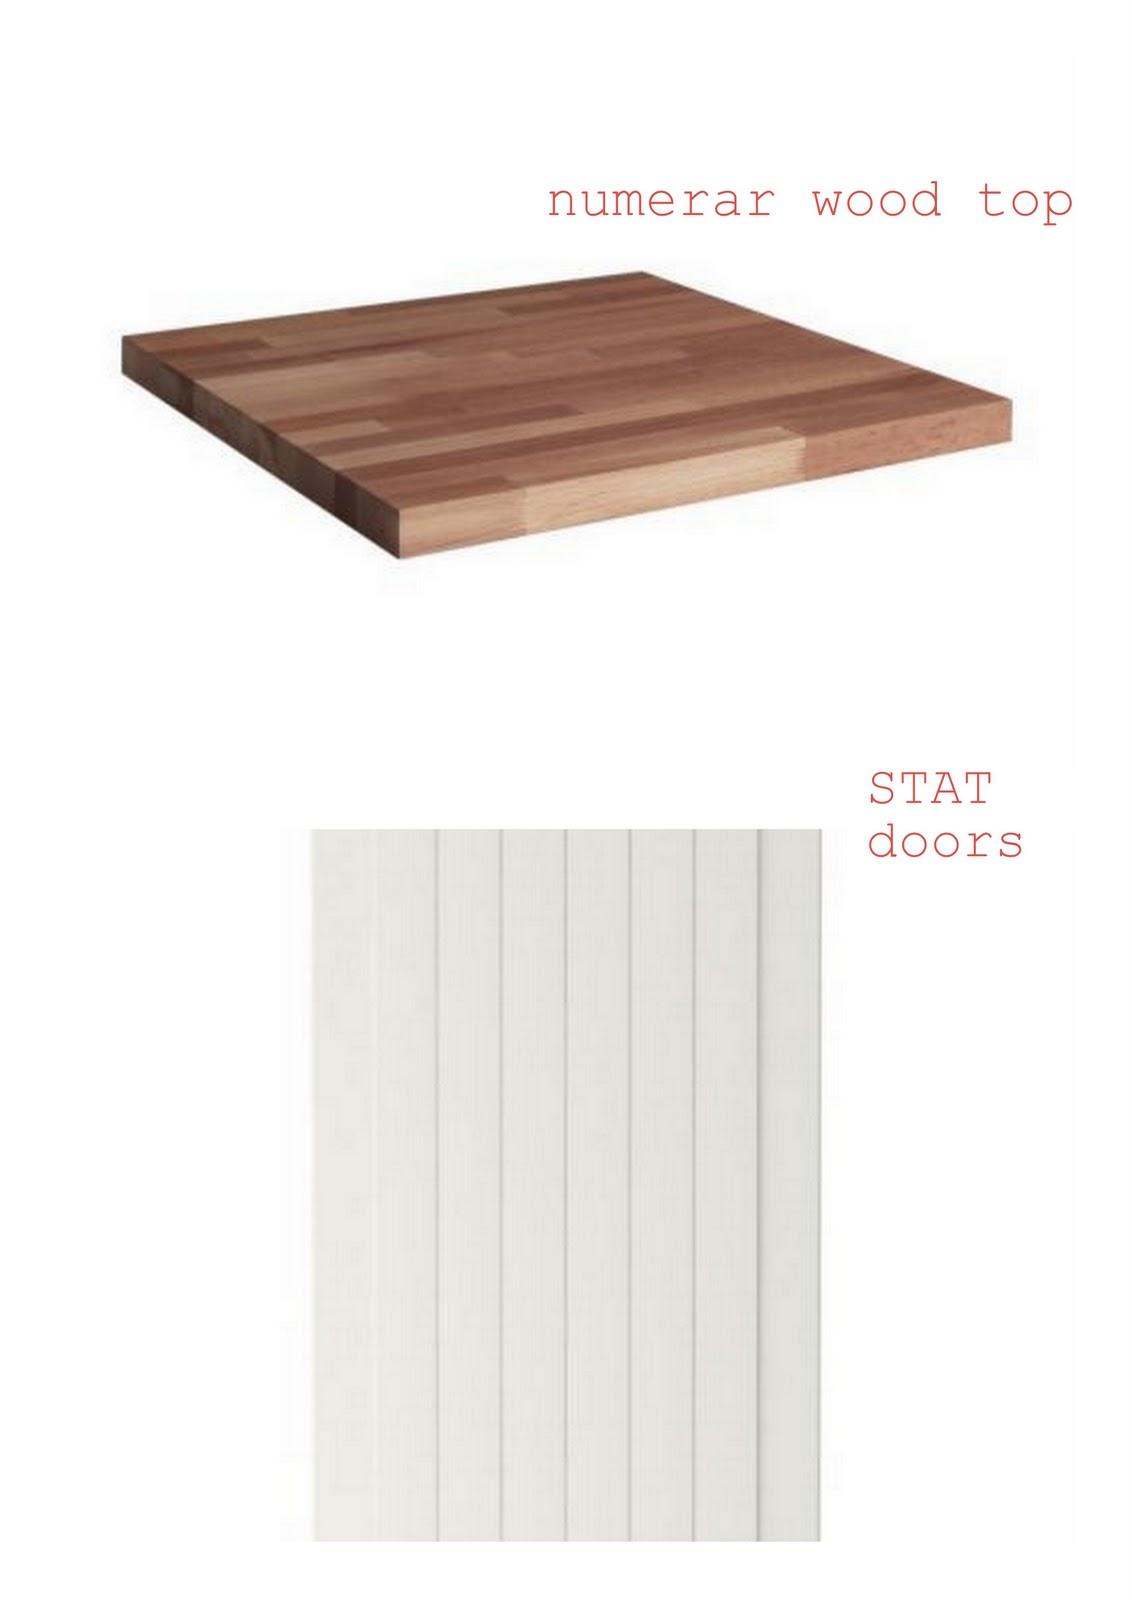 Ida interior lifestyle kitchen planning - Ikea planning cucina ...